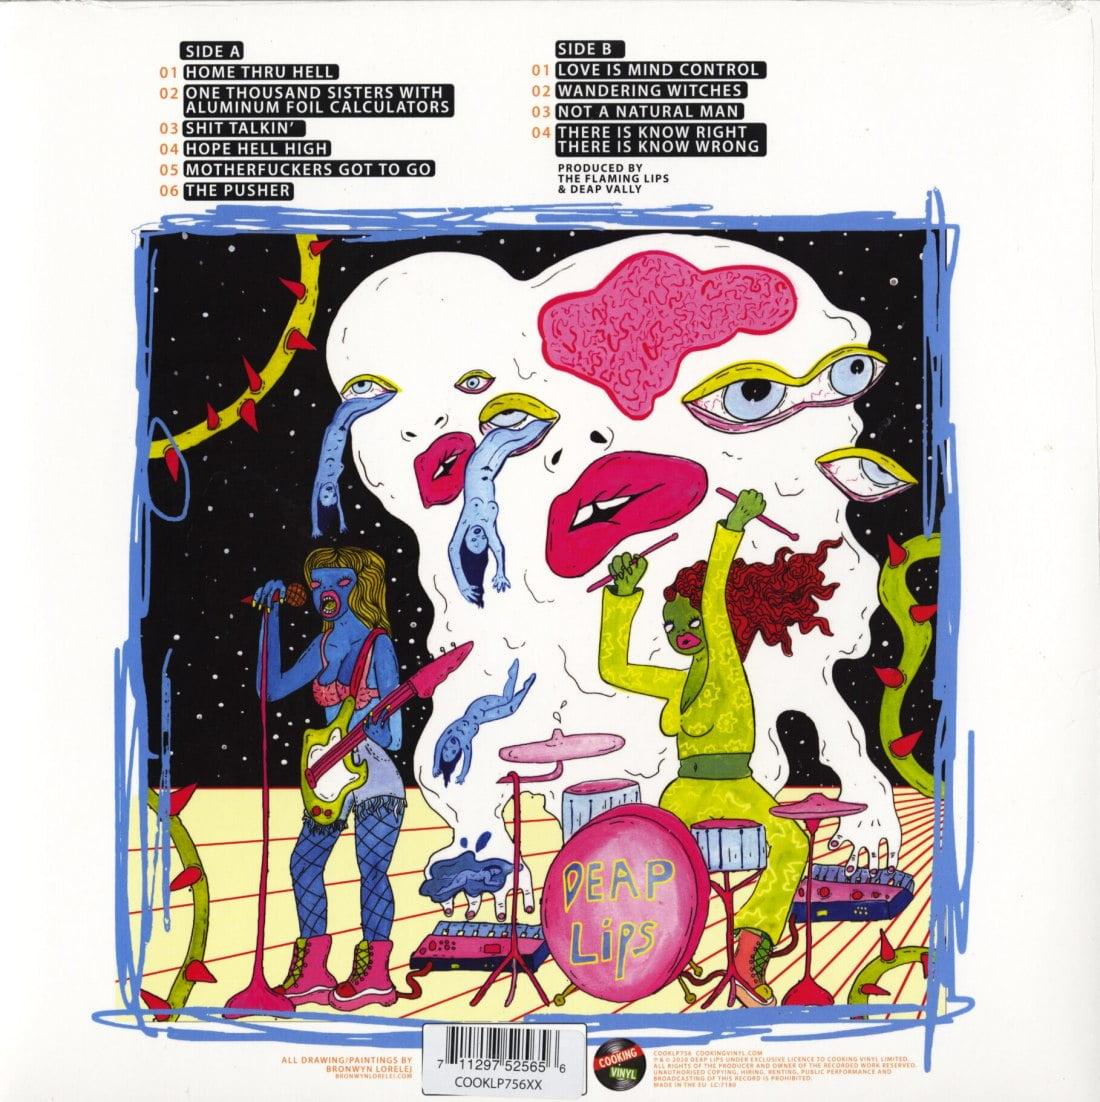 Deap Lips - Deap Lips - Limited Edition, White, Colored Vinyl, LP, Cooking Vinyl, 2020